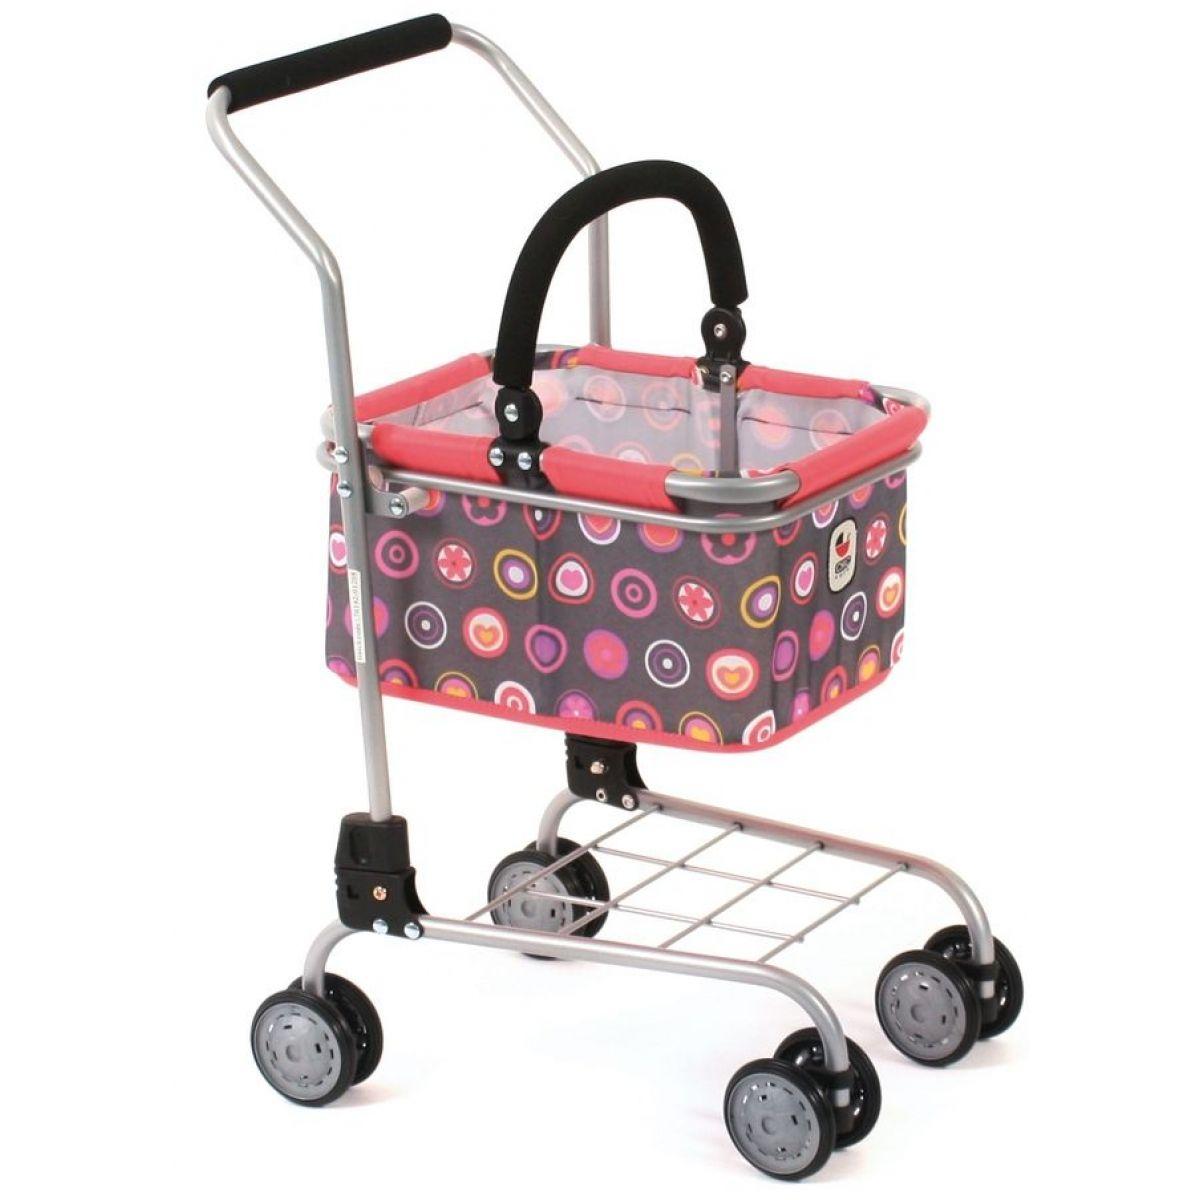 Bayer Chic  Nákupní vozík - Galaxy Coral